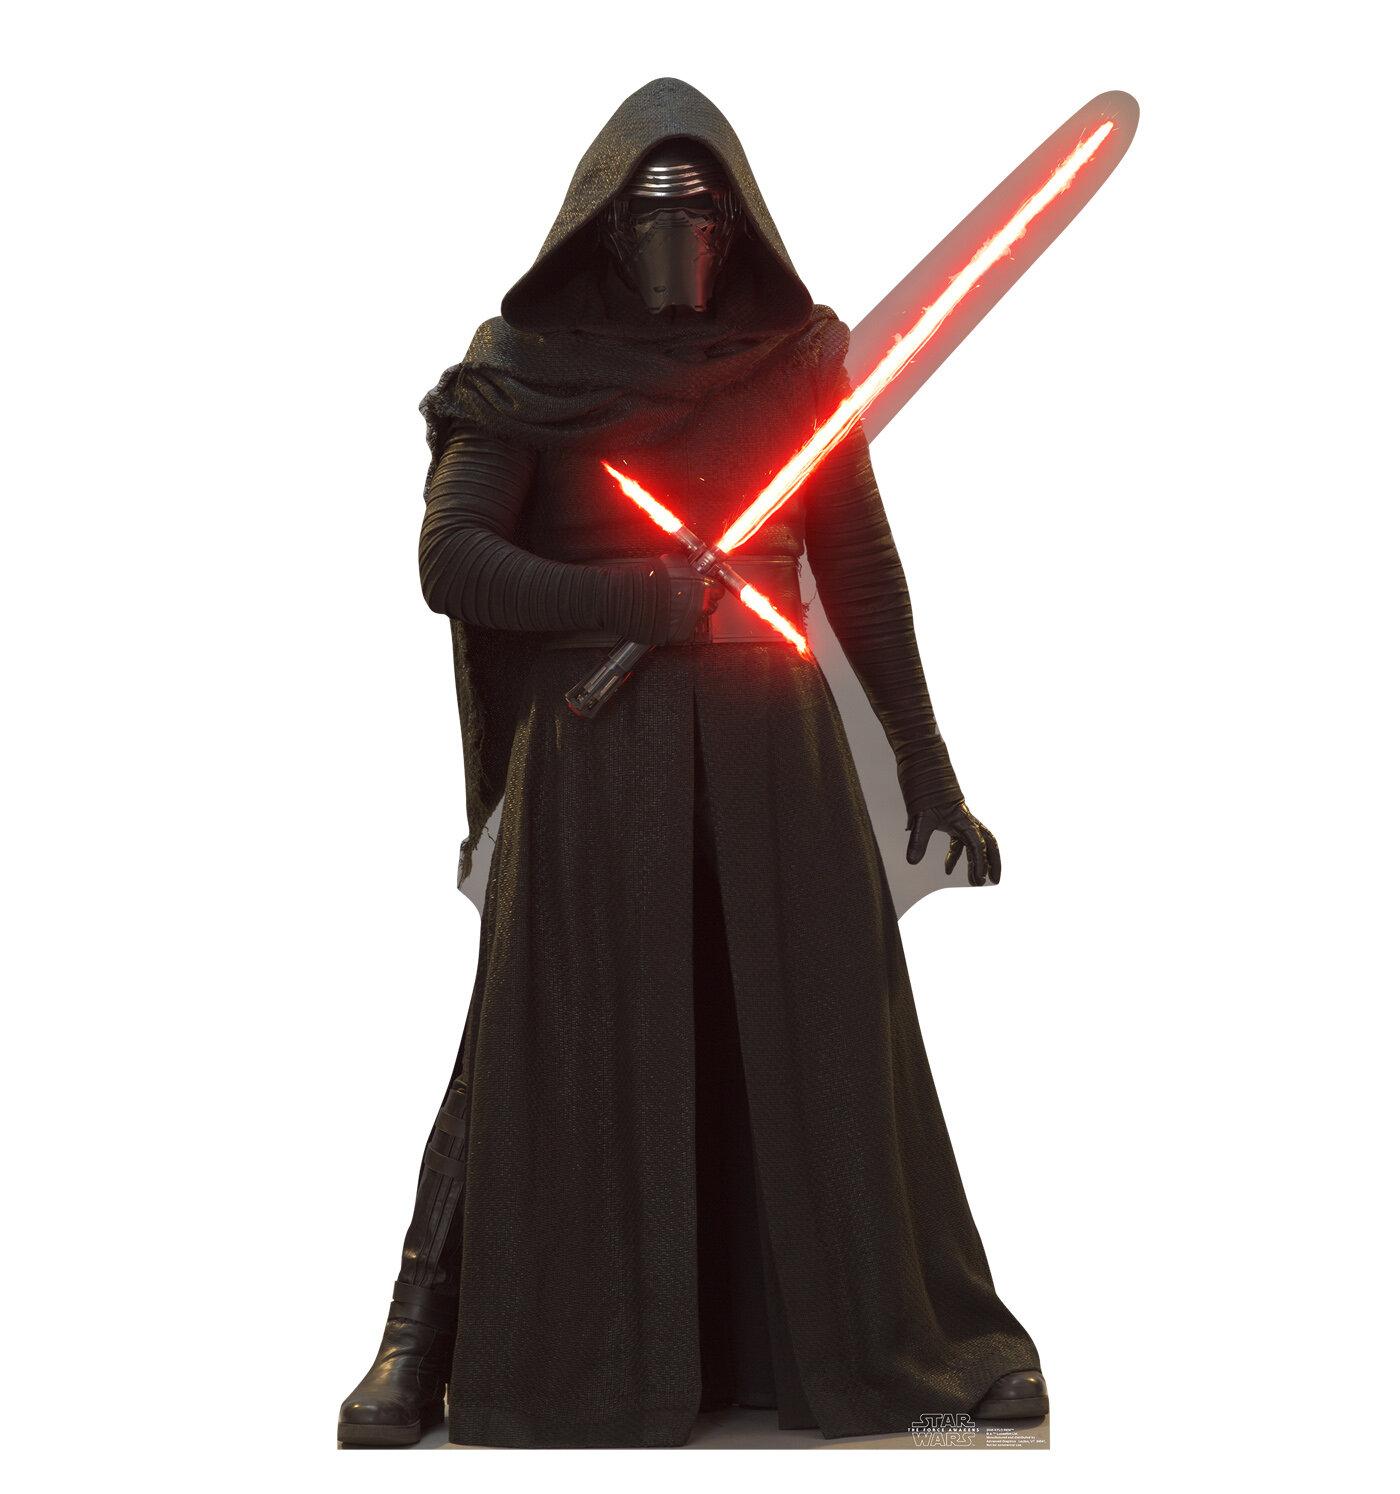 Advanced Graphics Star Wars Episode Vii The Force Awakens Kylo Ren Cardboard Cutout Reviews Wayfair